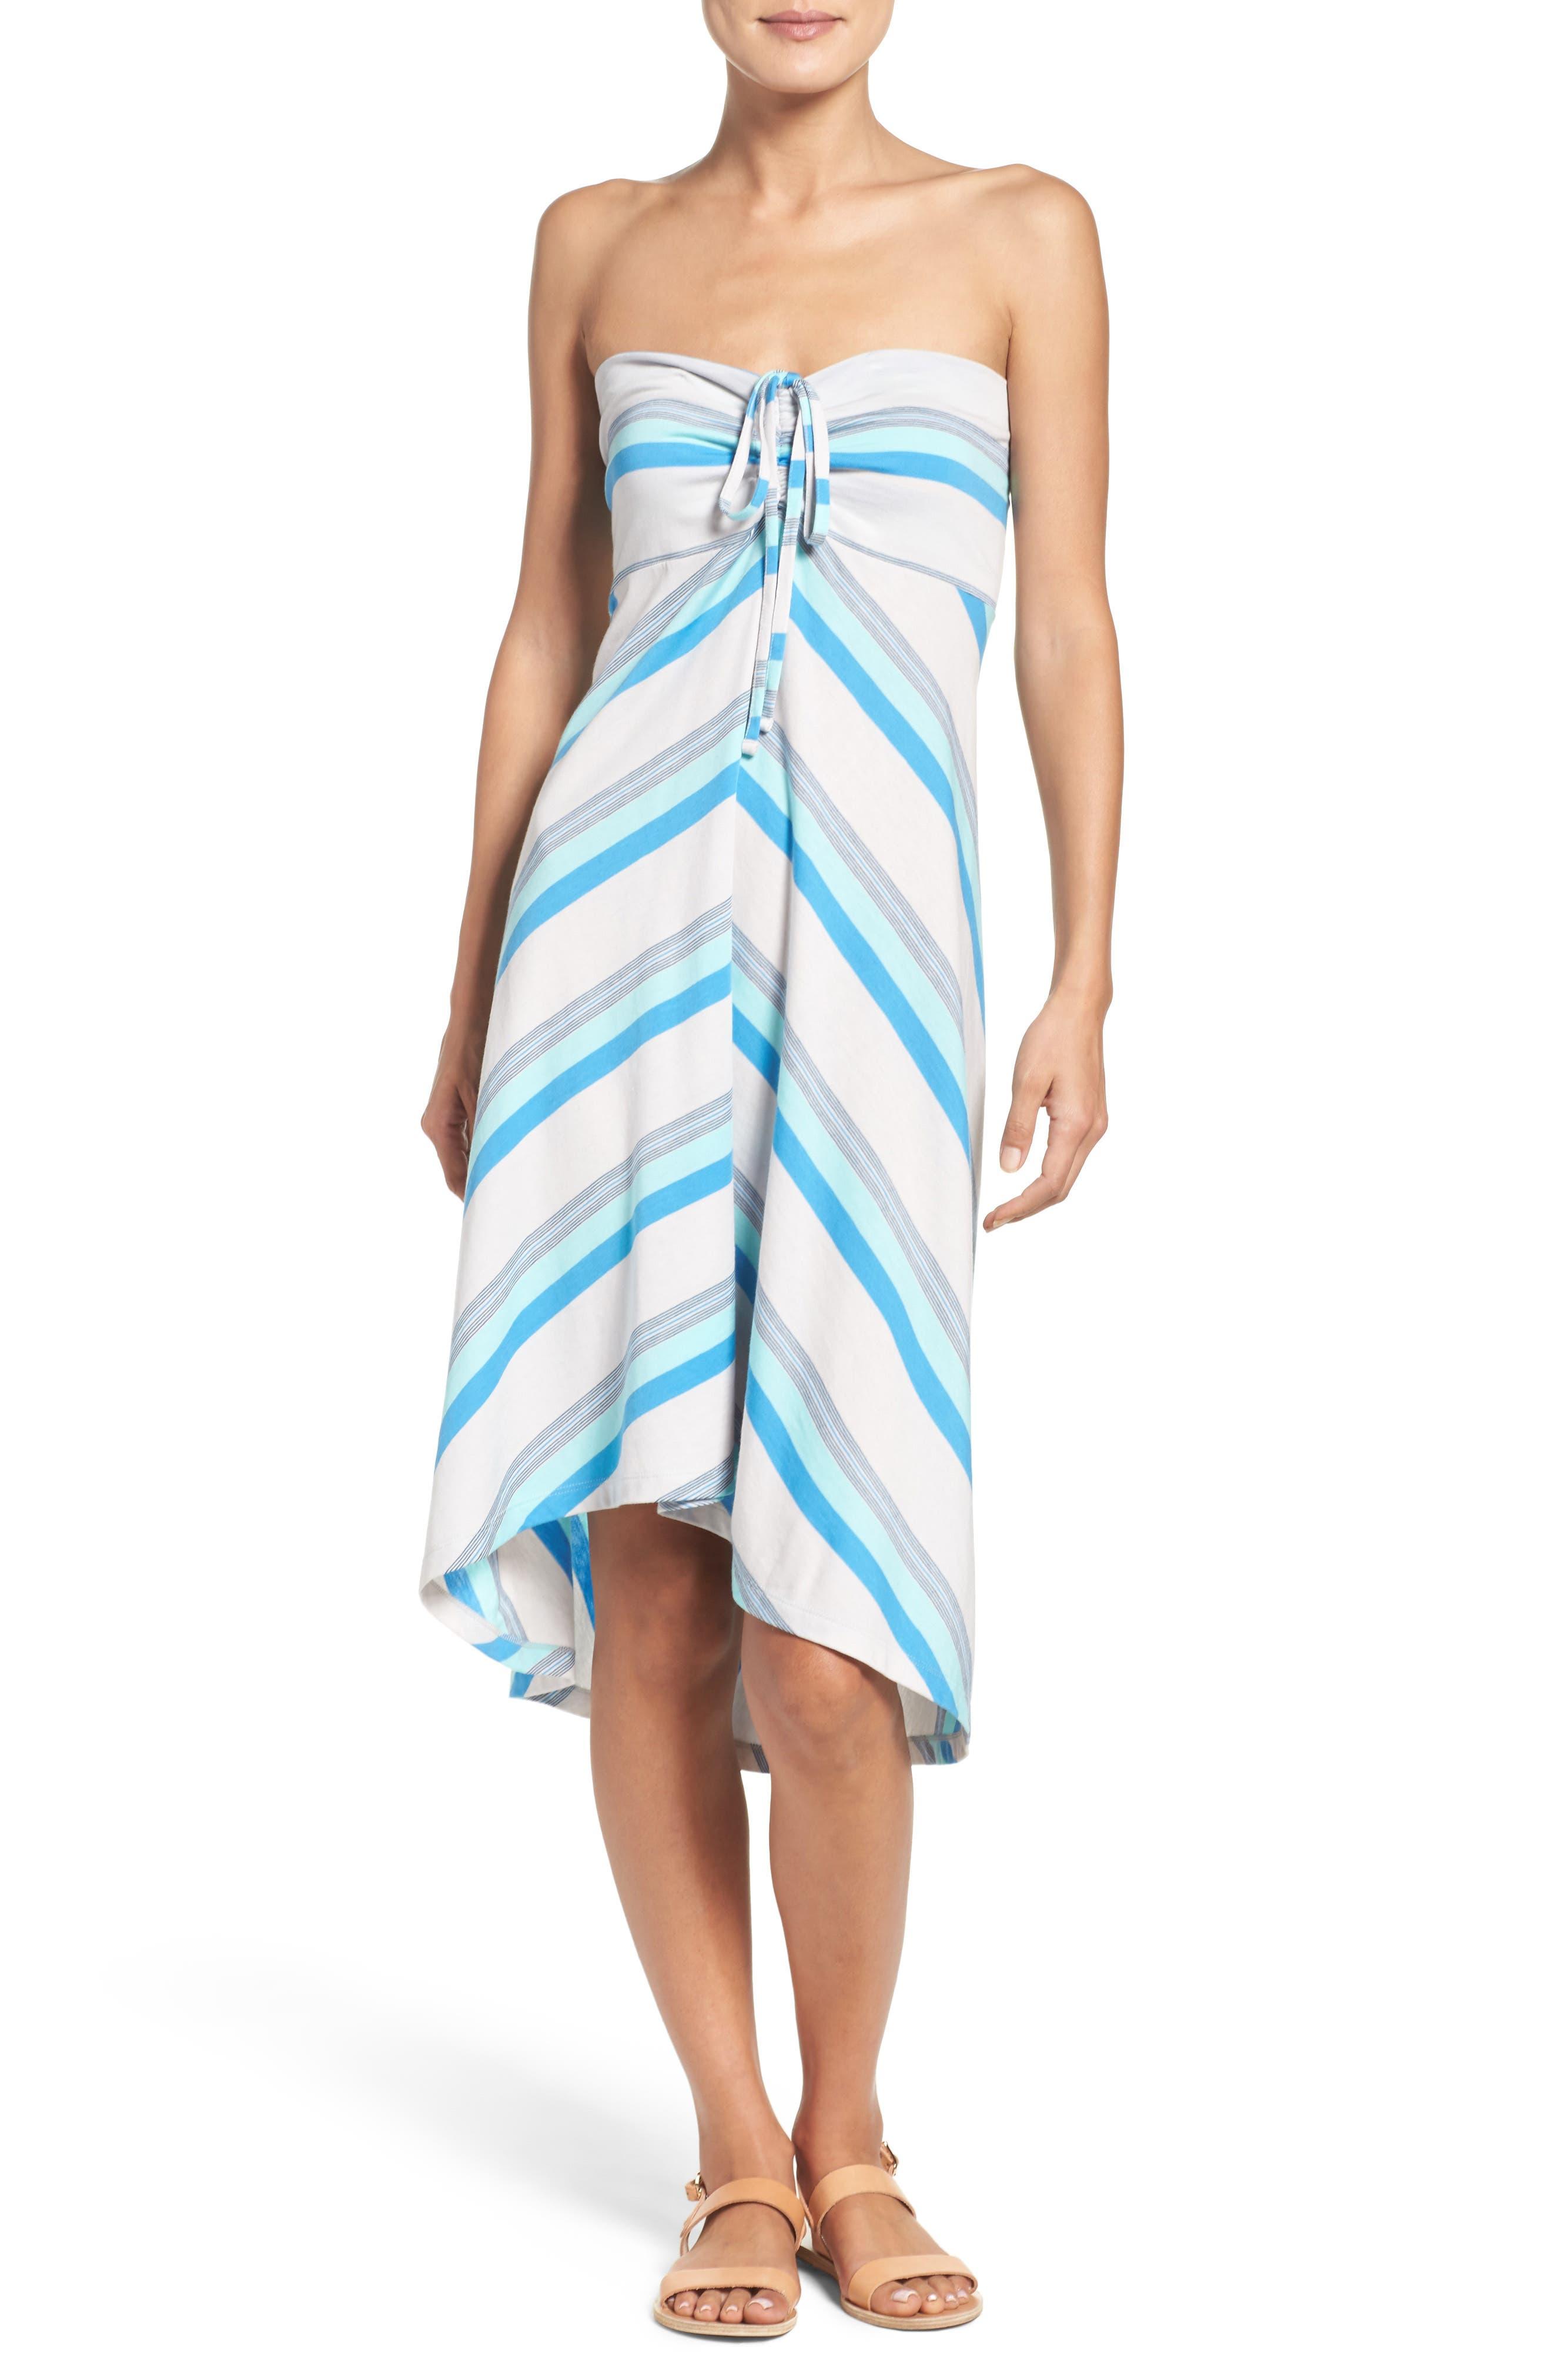 Patagonia Kamala Convertible Jersey Skirt